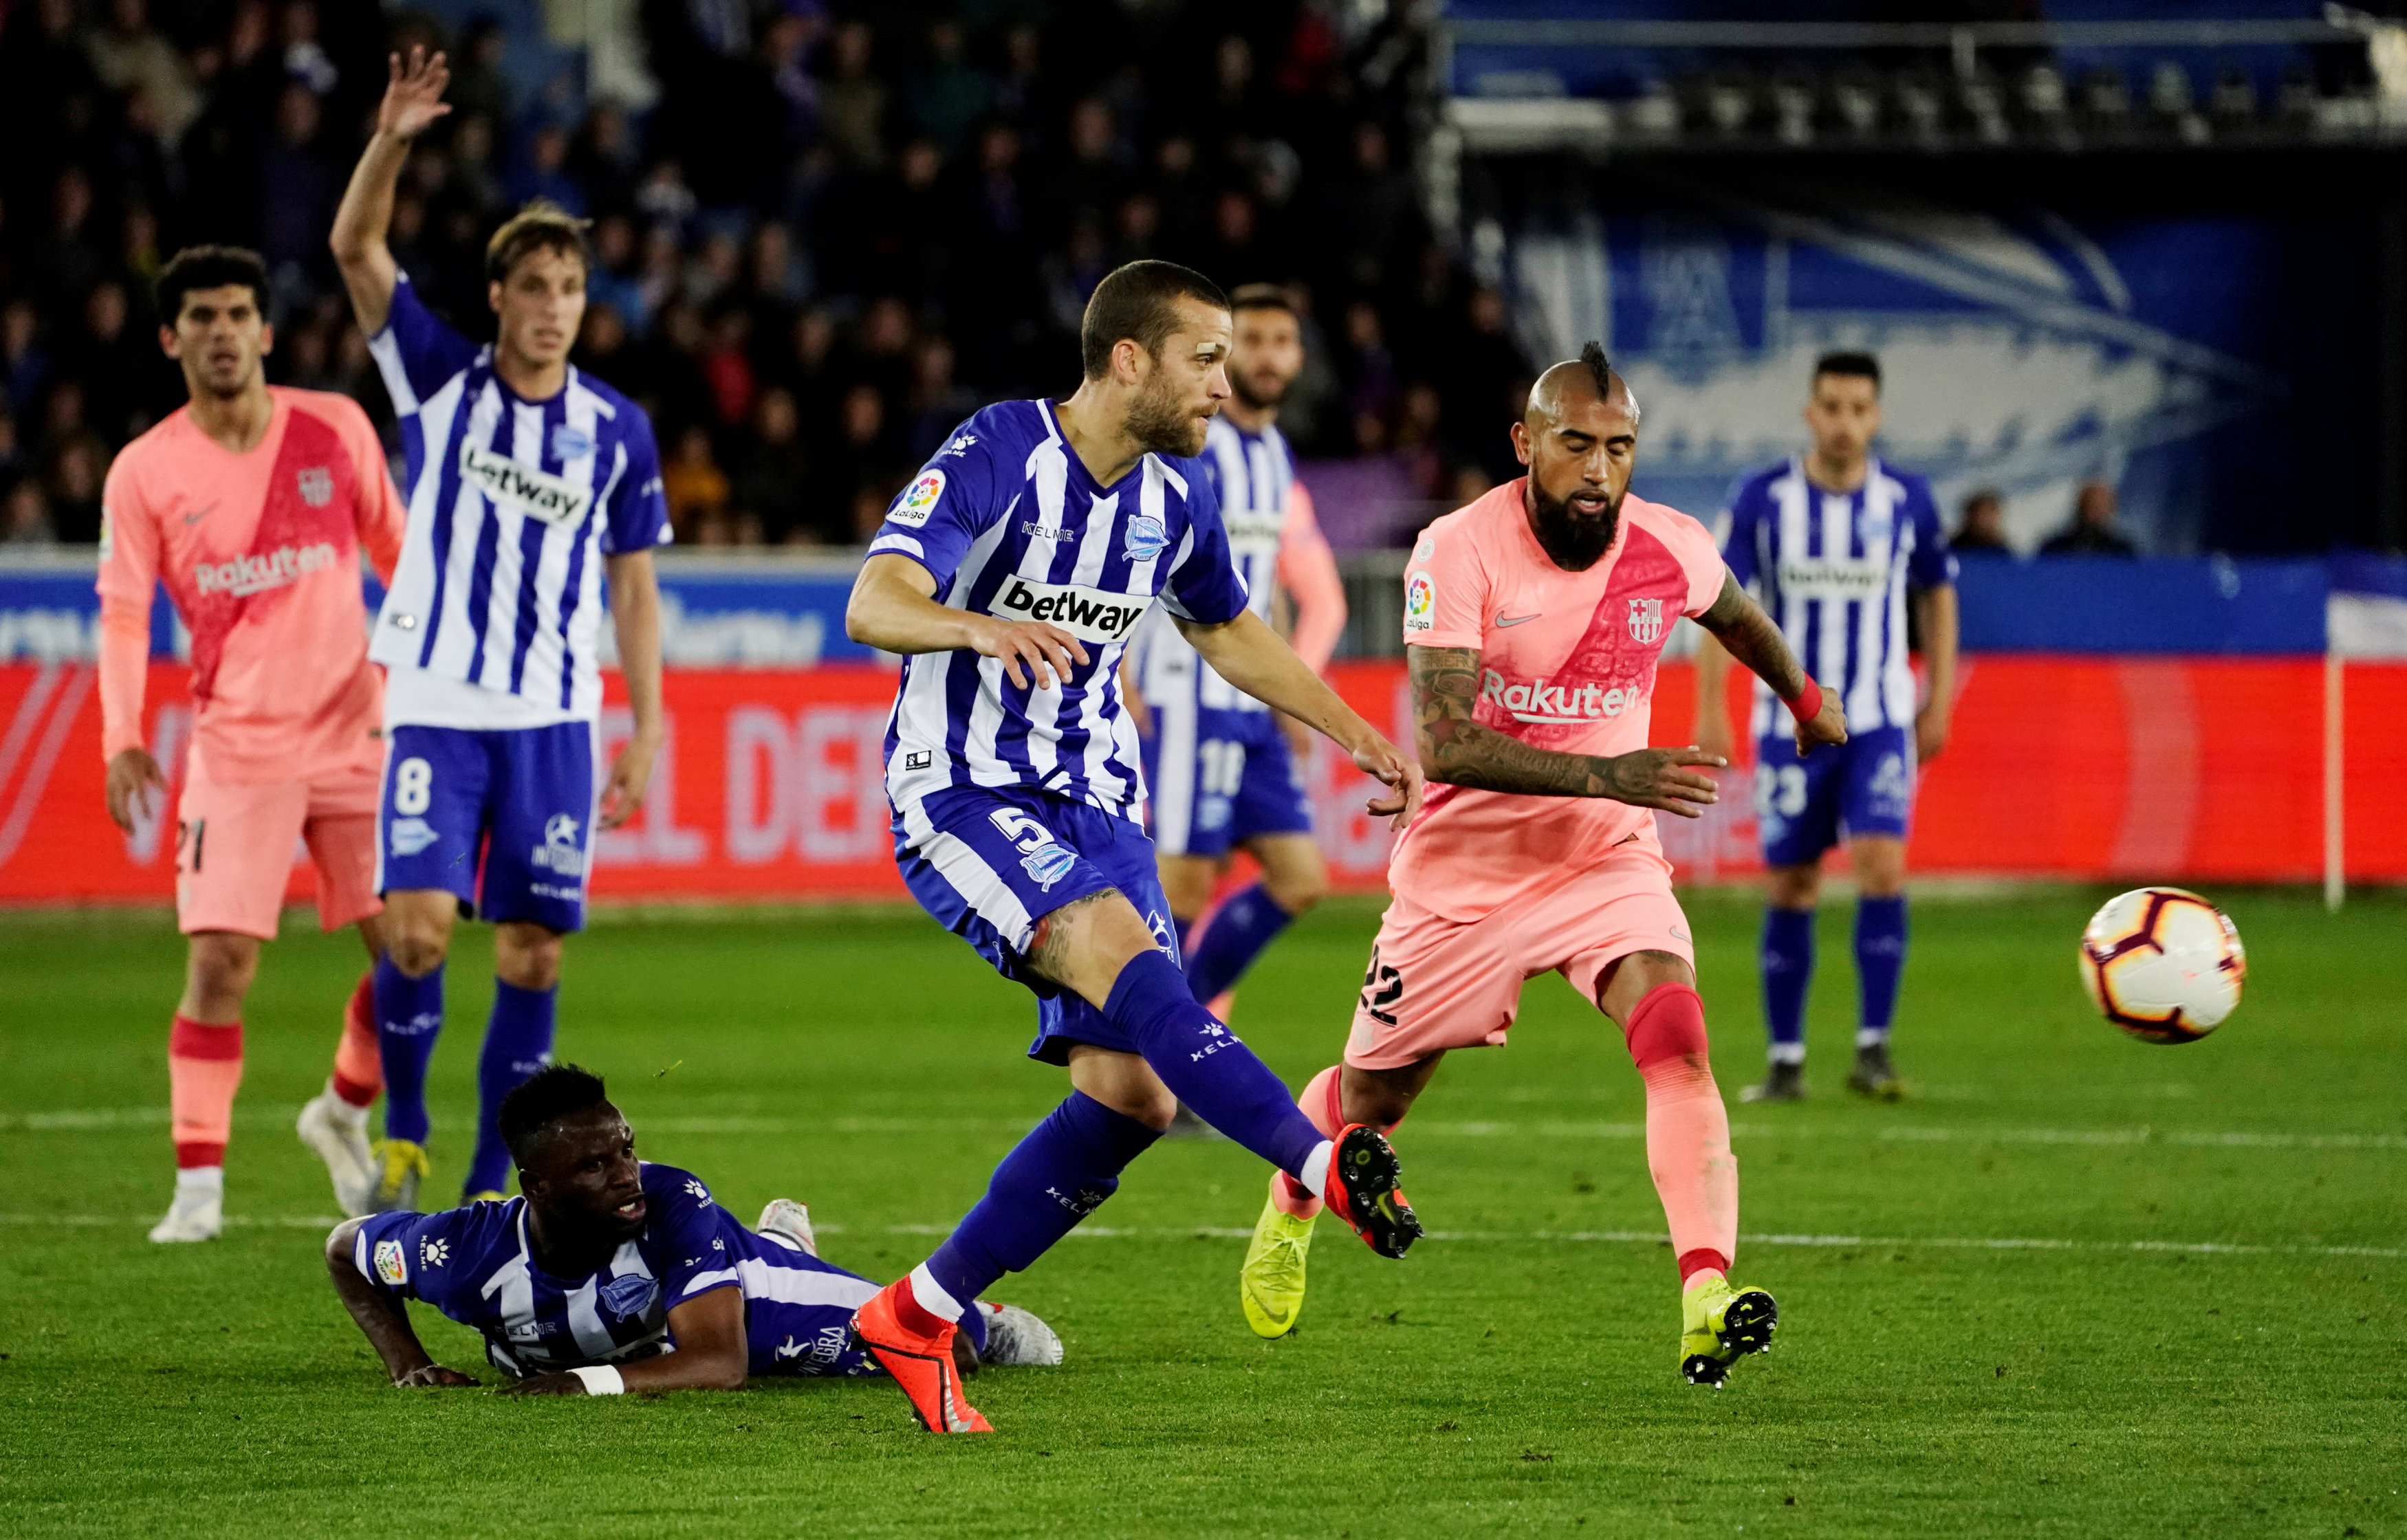 Deportivo Alavés Salaries 2019/20